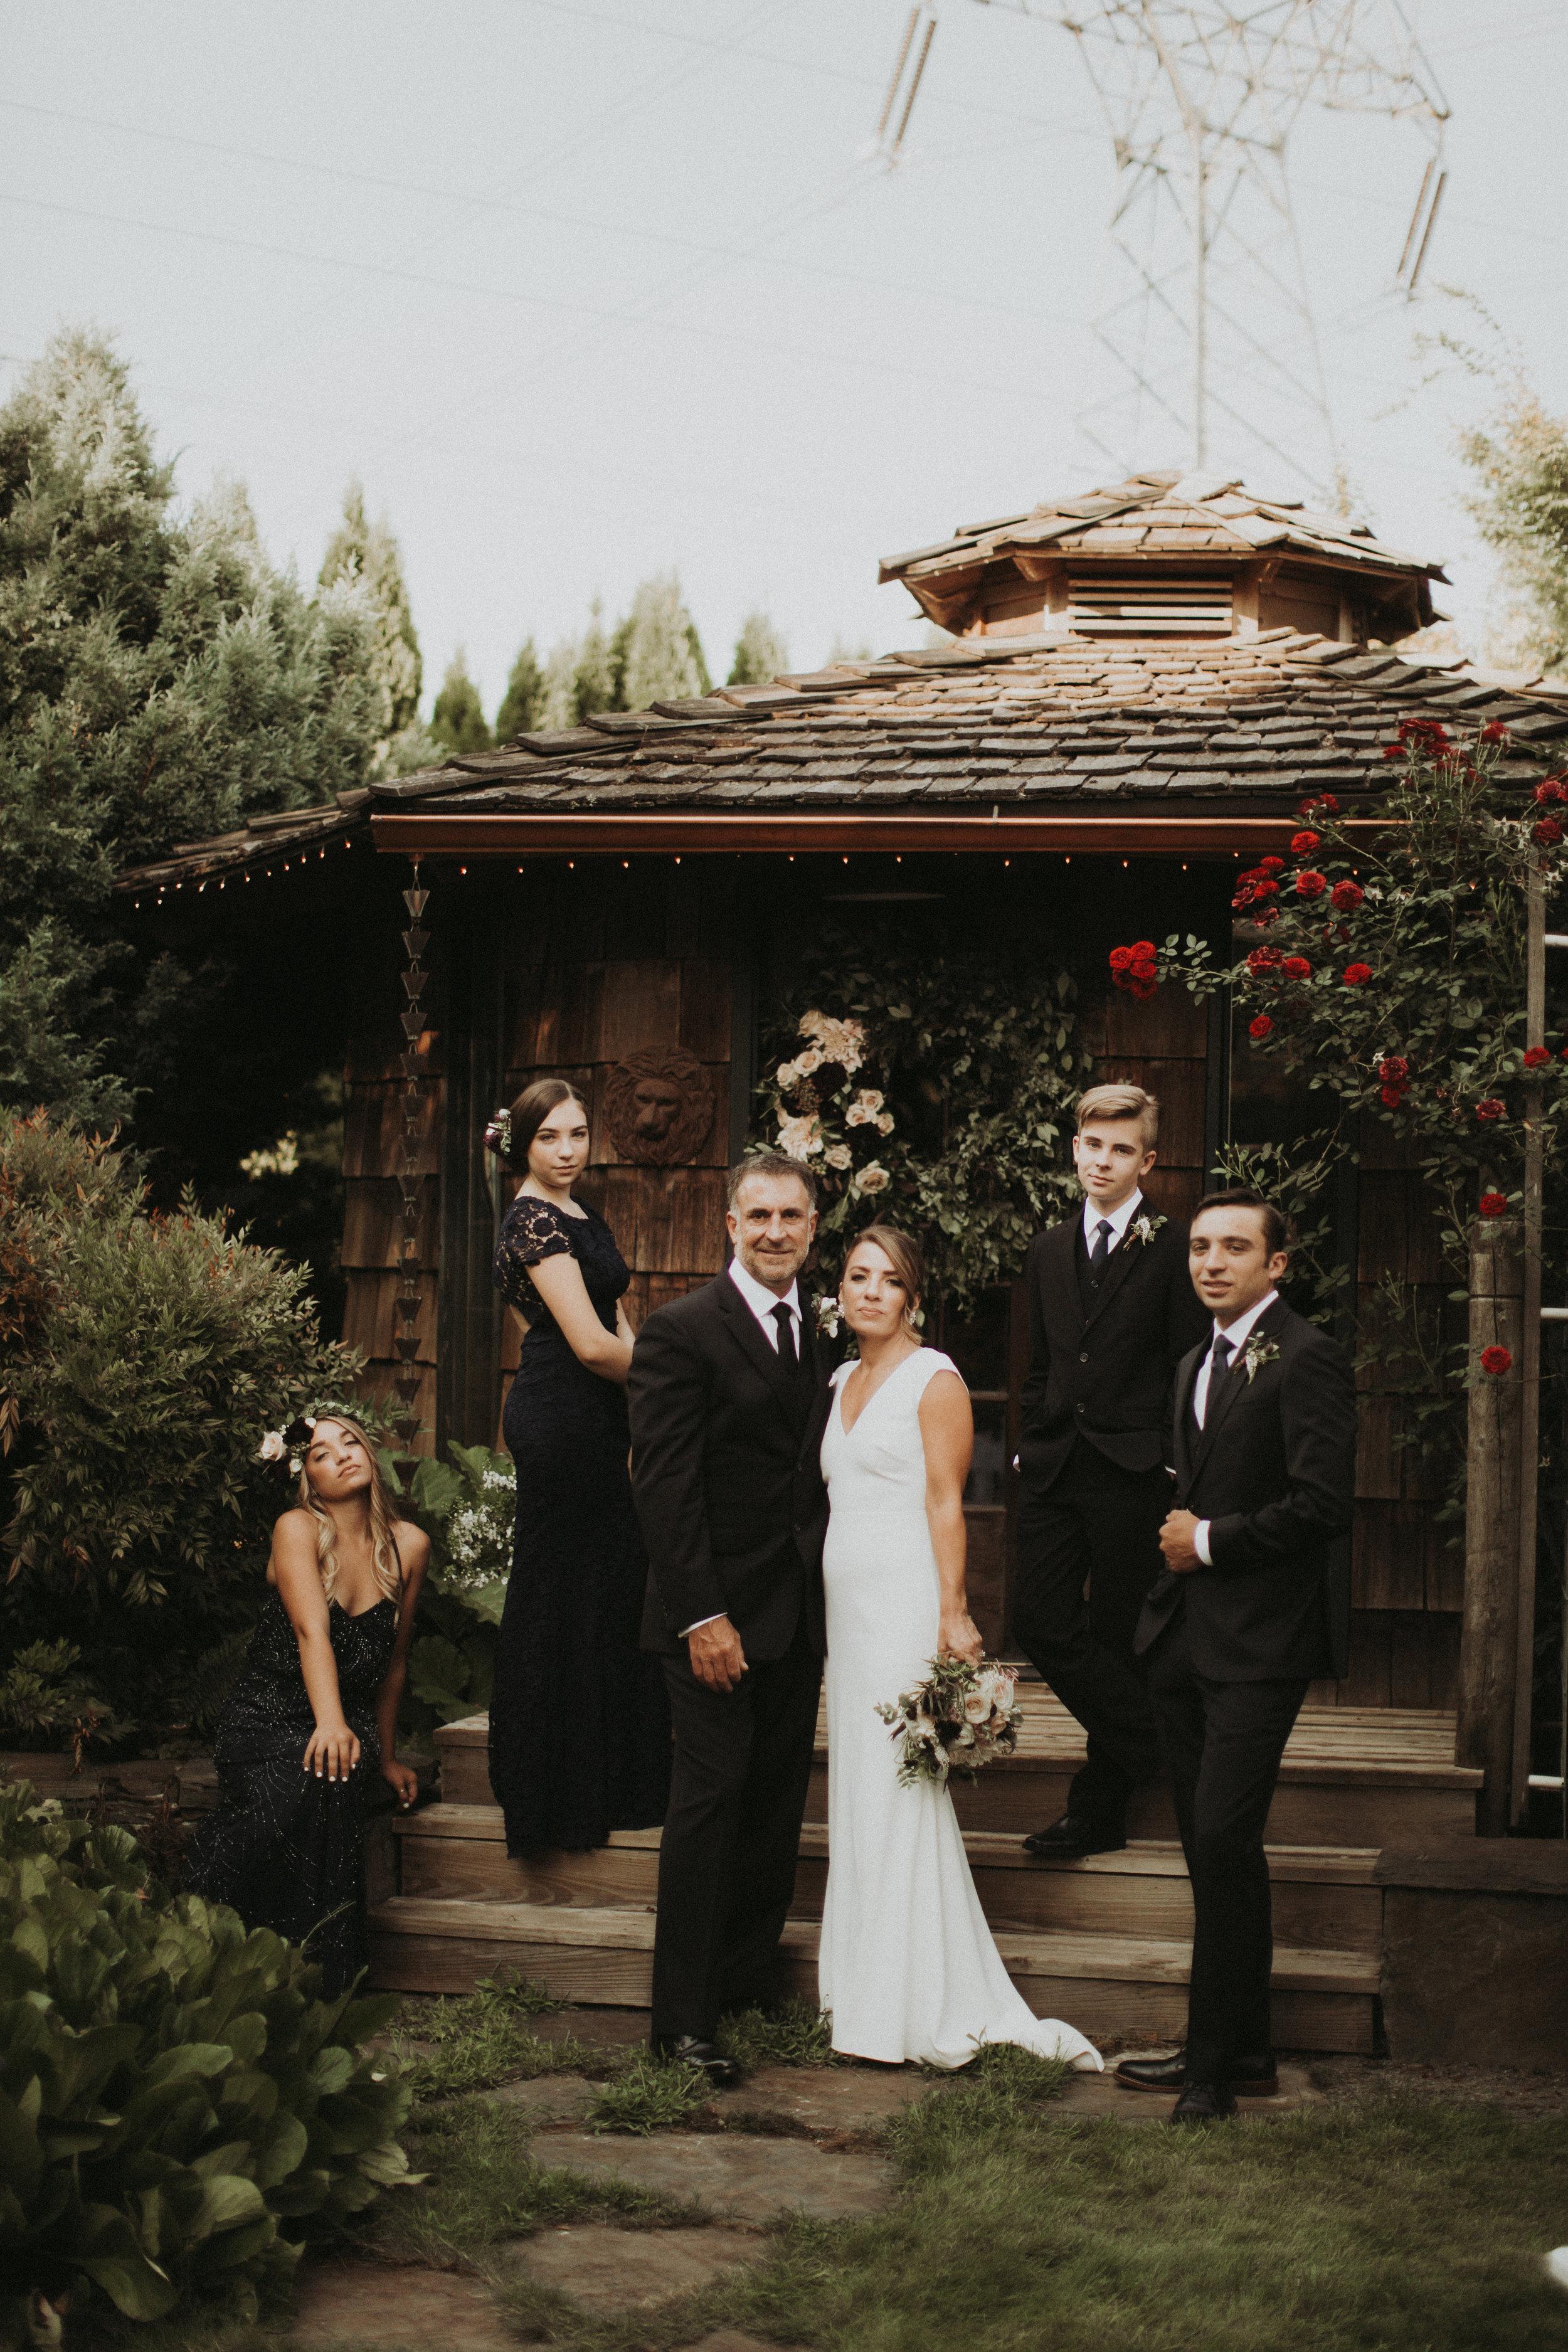 PORTLAND INTIMATE BACKYARD WEDDING_JENNY CHOKBENGBOUN PHOTO-341.JPG